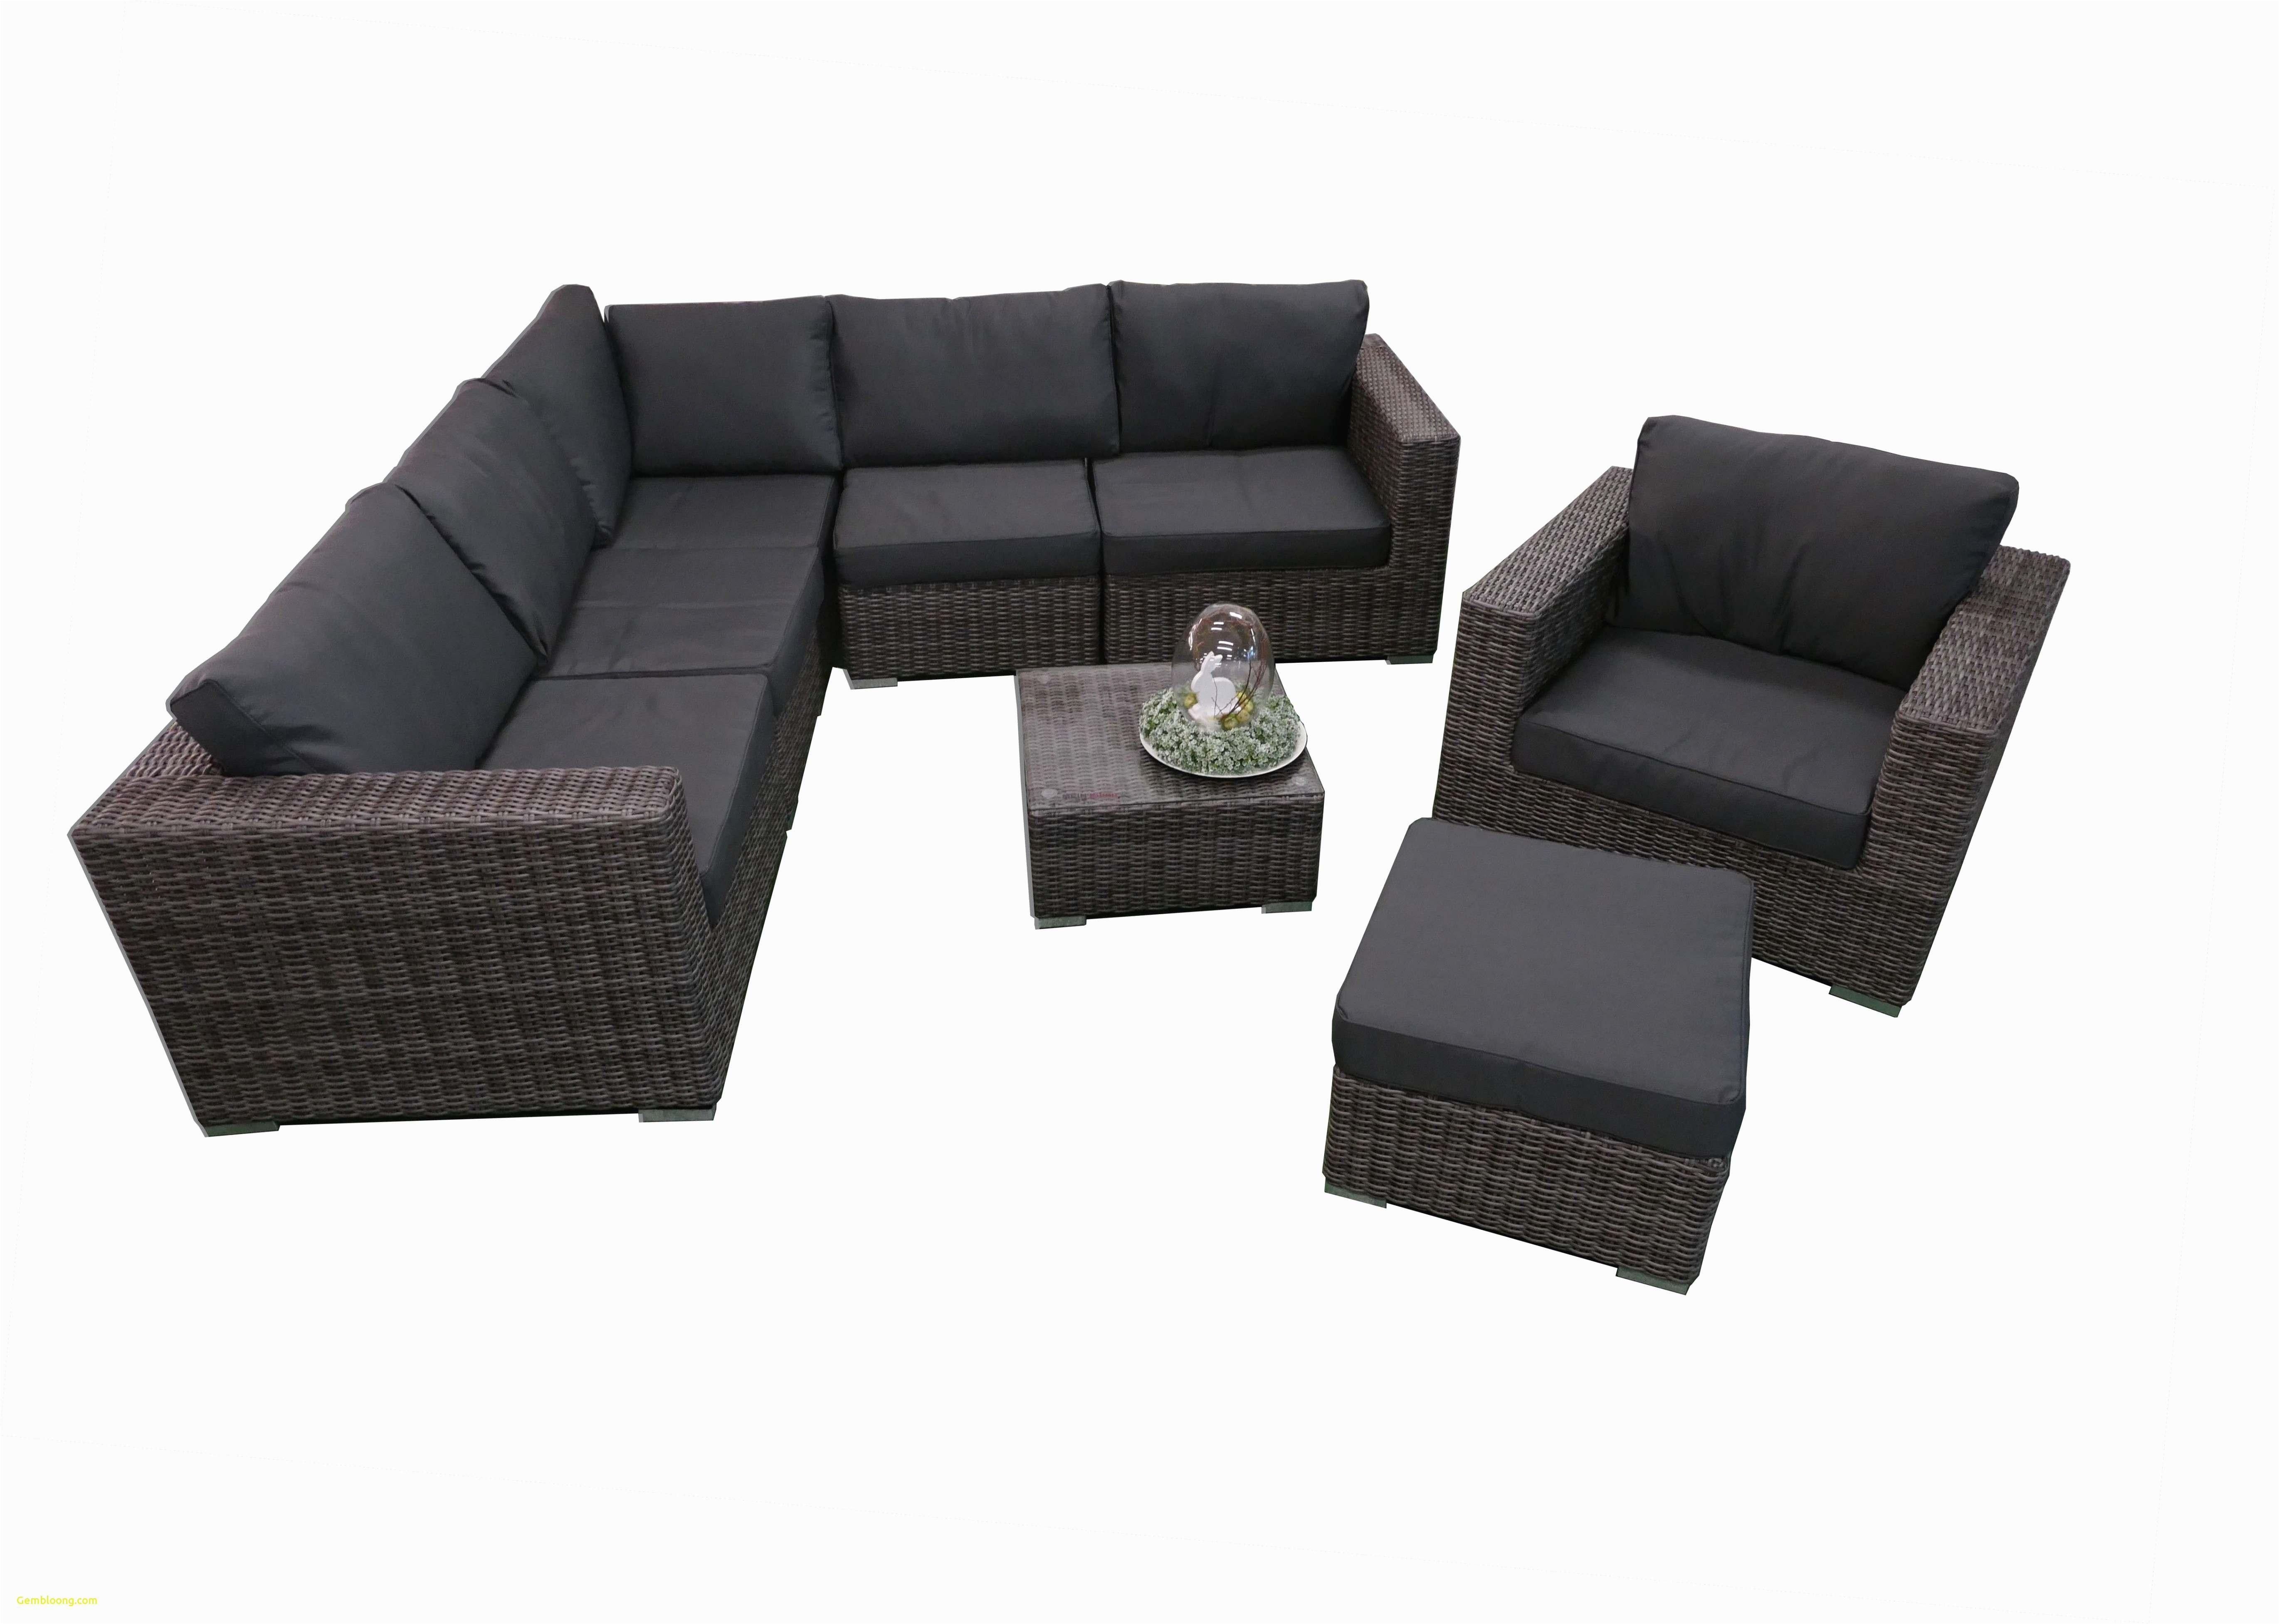 walmart no receipt return policy model home design patio tables at walmart fresh wicker outdoor sofa